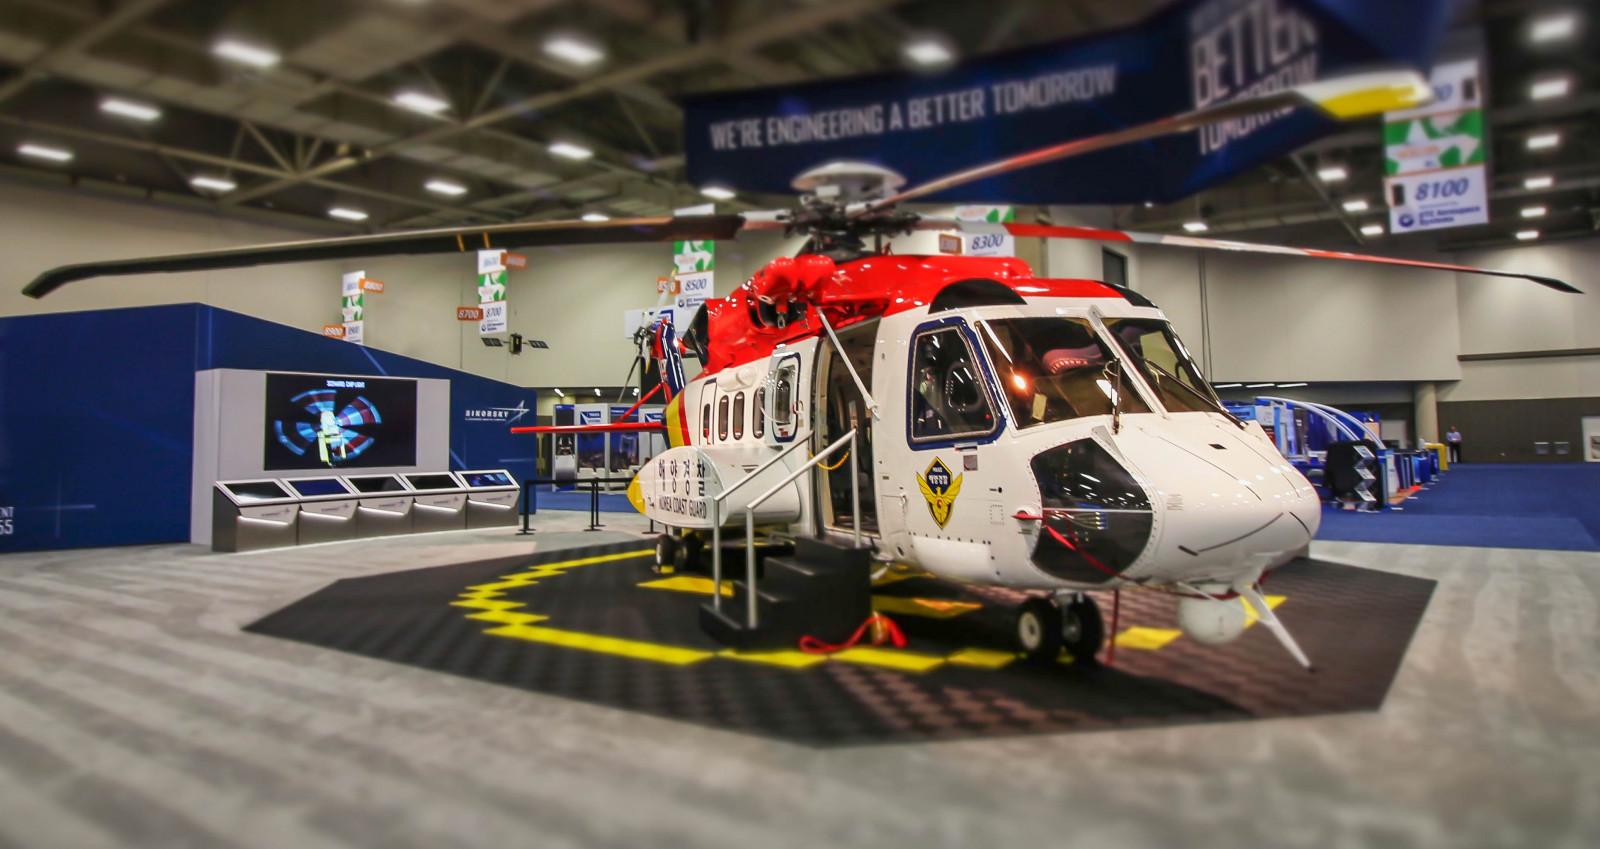 Un Elicottero : Sfondi rotore di un elicottero aereo rotorcraft ingegneria